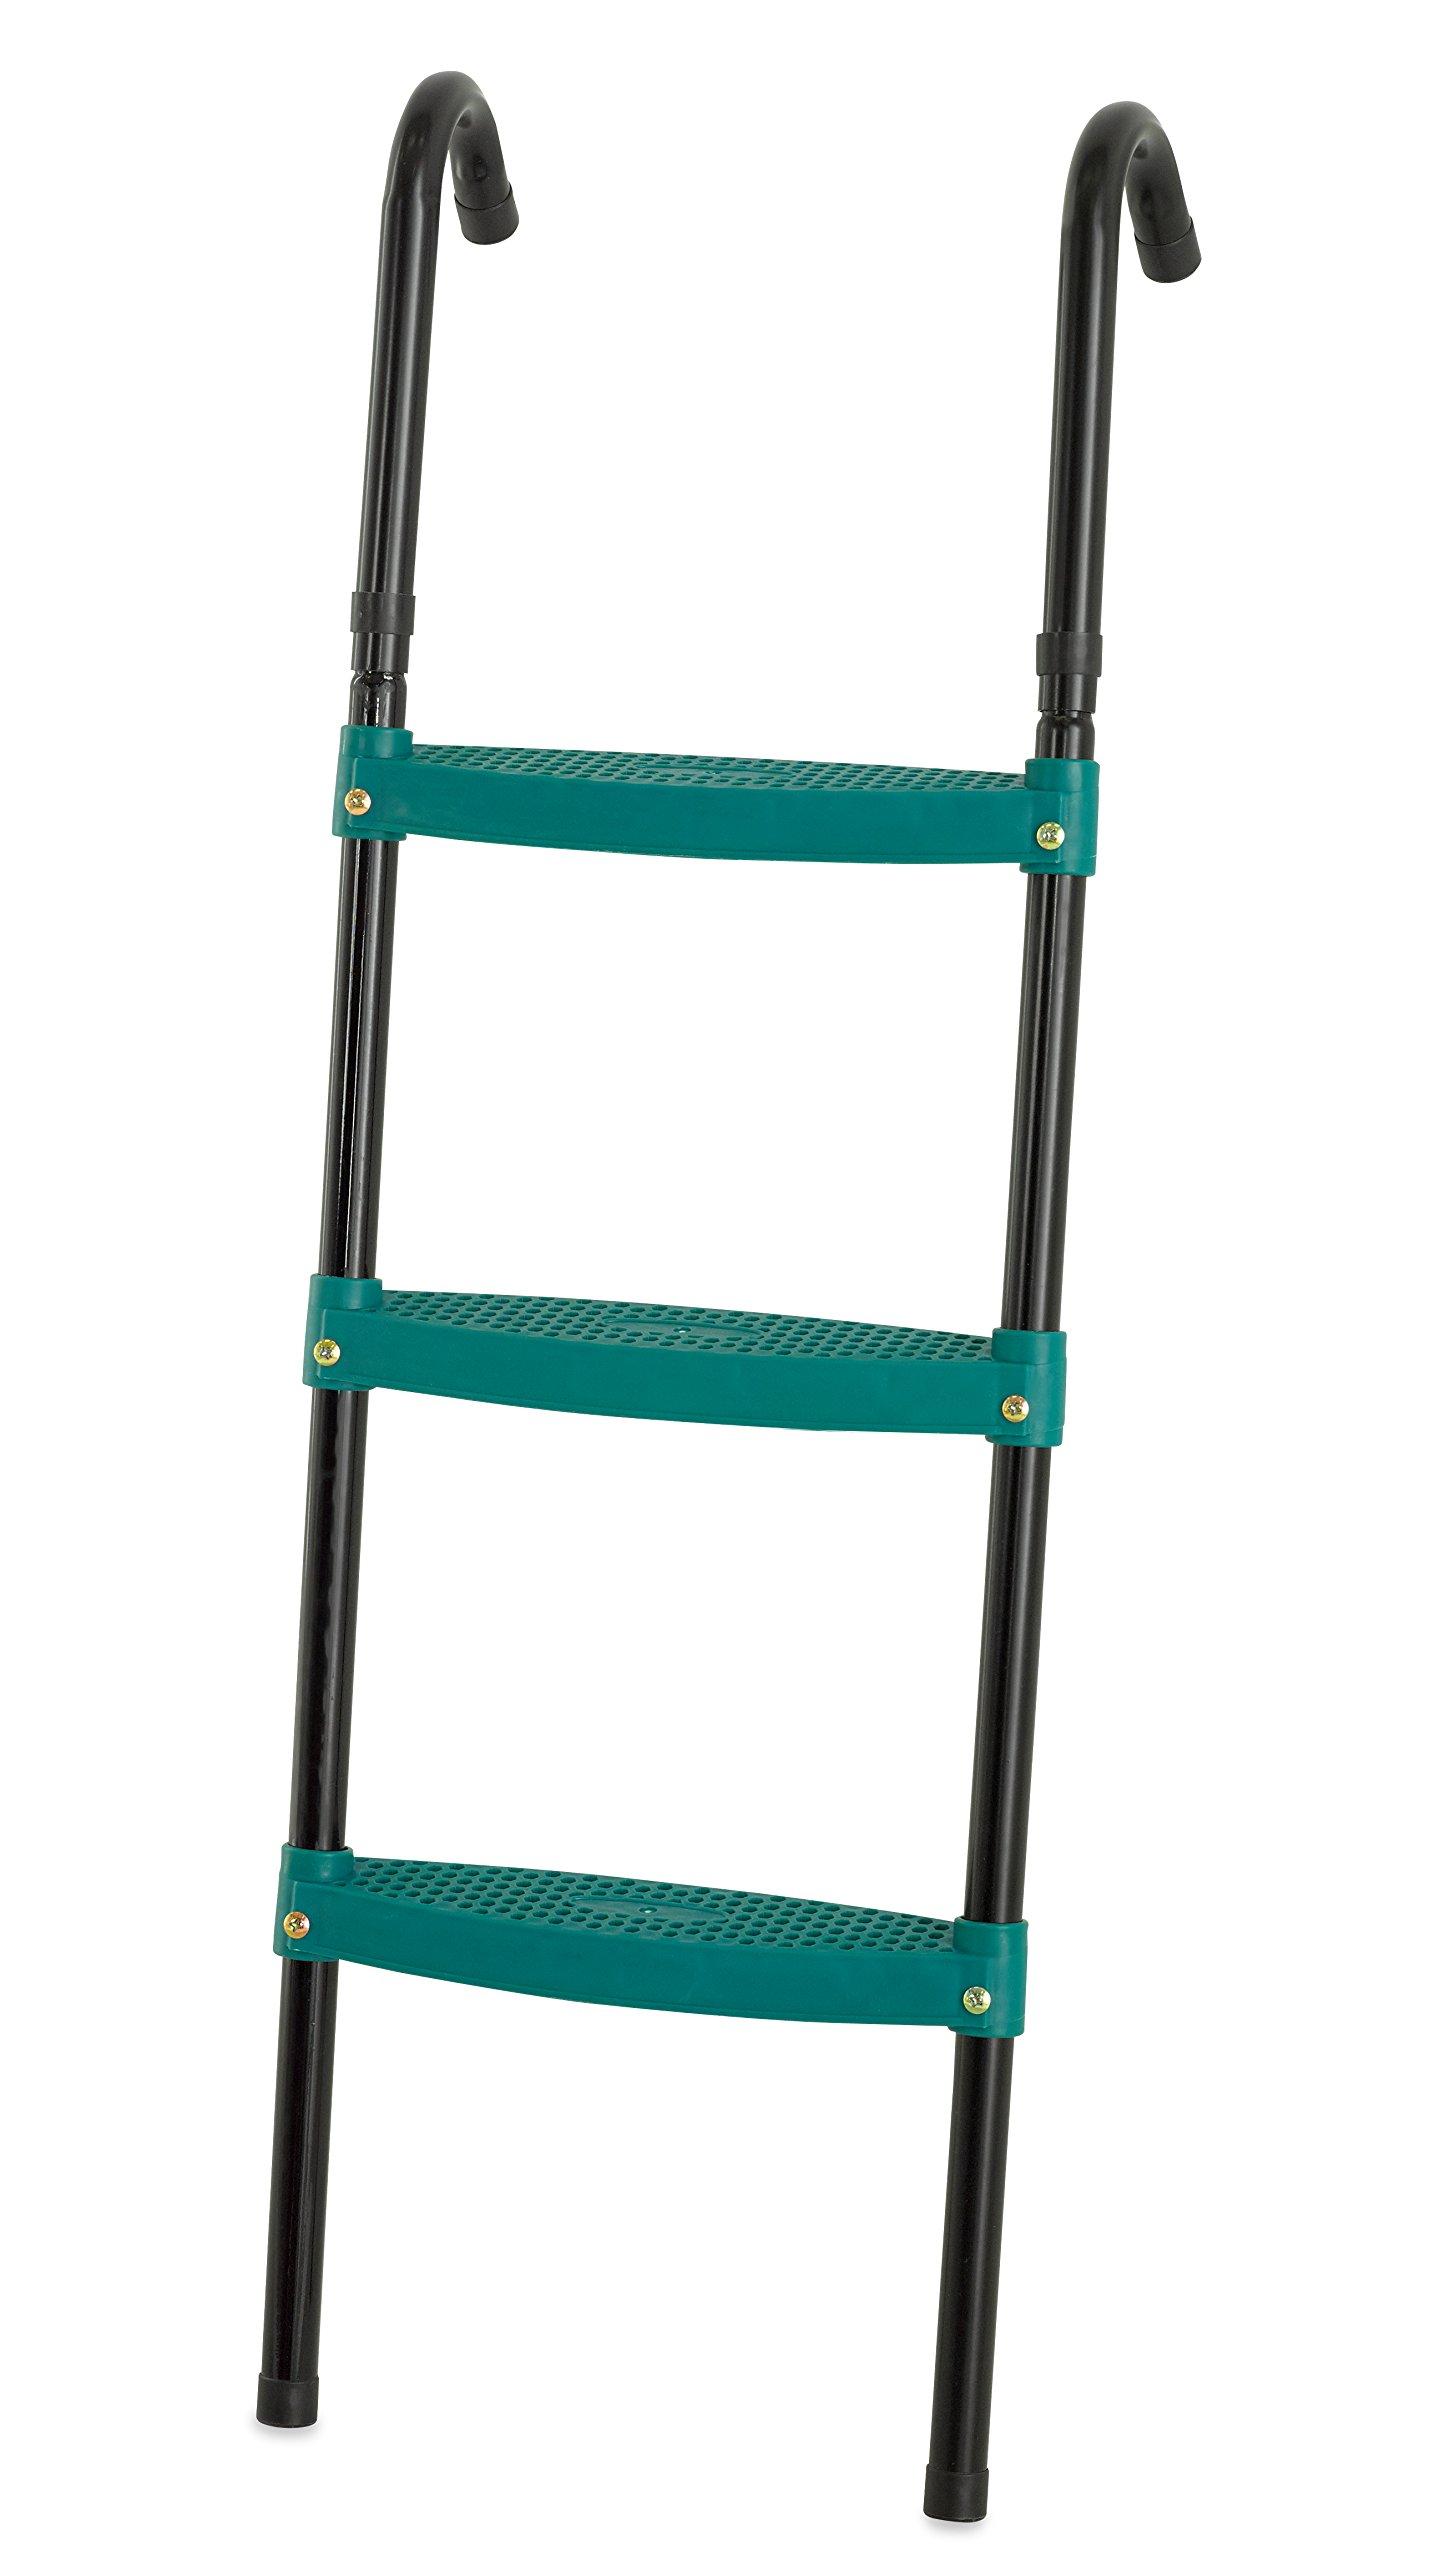 Upper Bounce 40'' Trampoline Ladder 3 Steps Foldable - Green by Upper Bounce